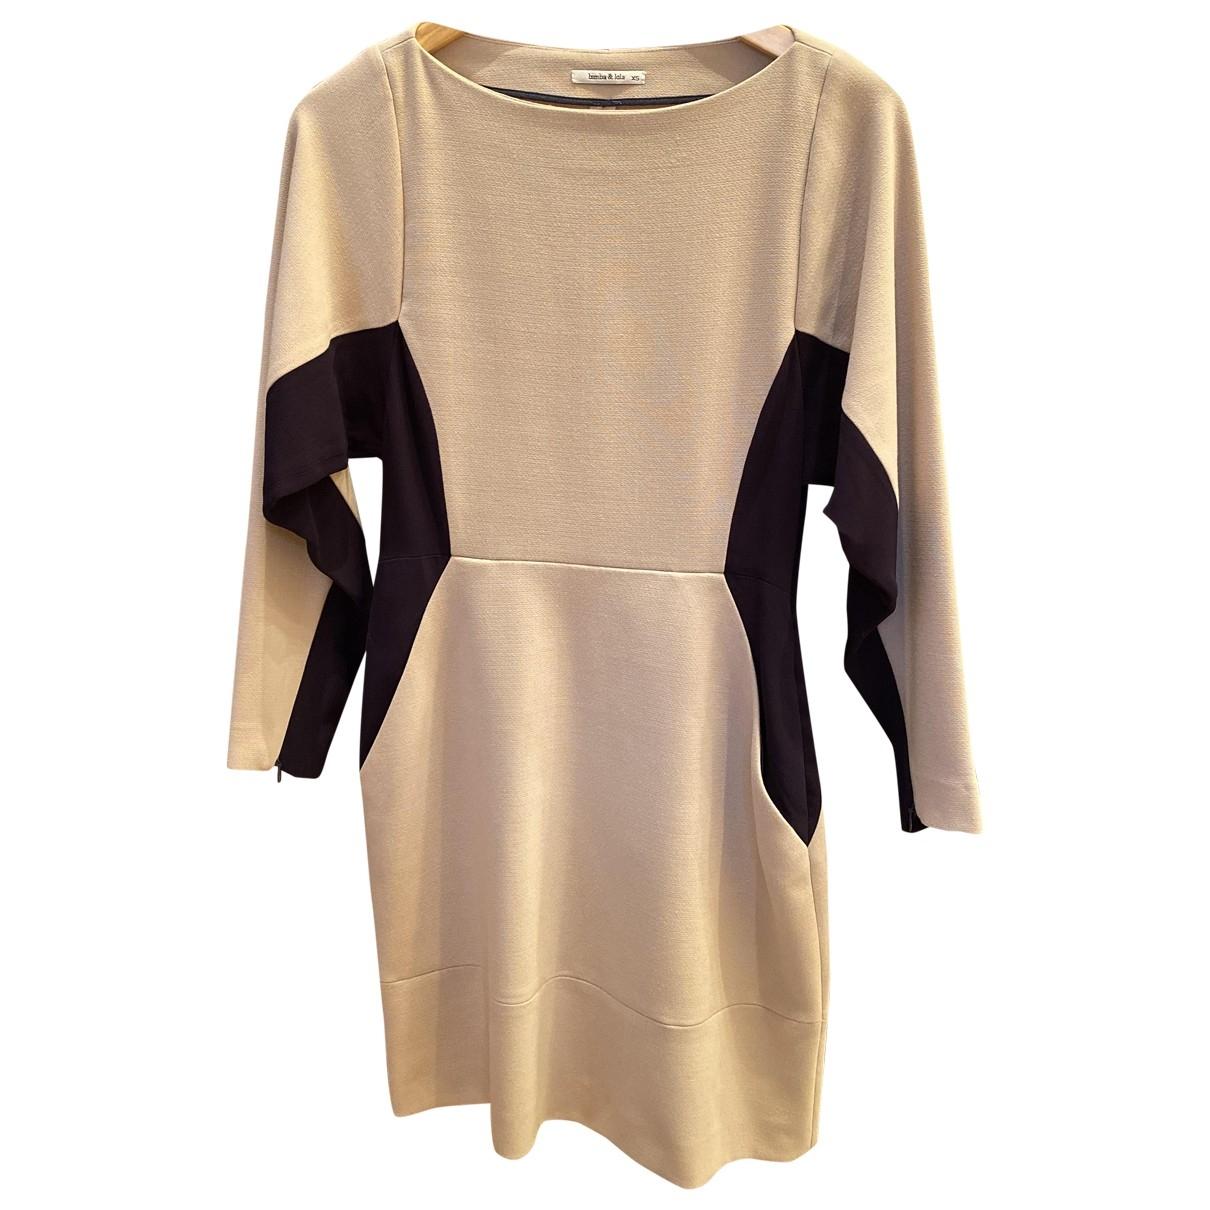 Bimba Y Lola \N Grey dress for Women XS International